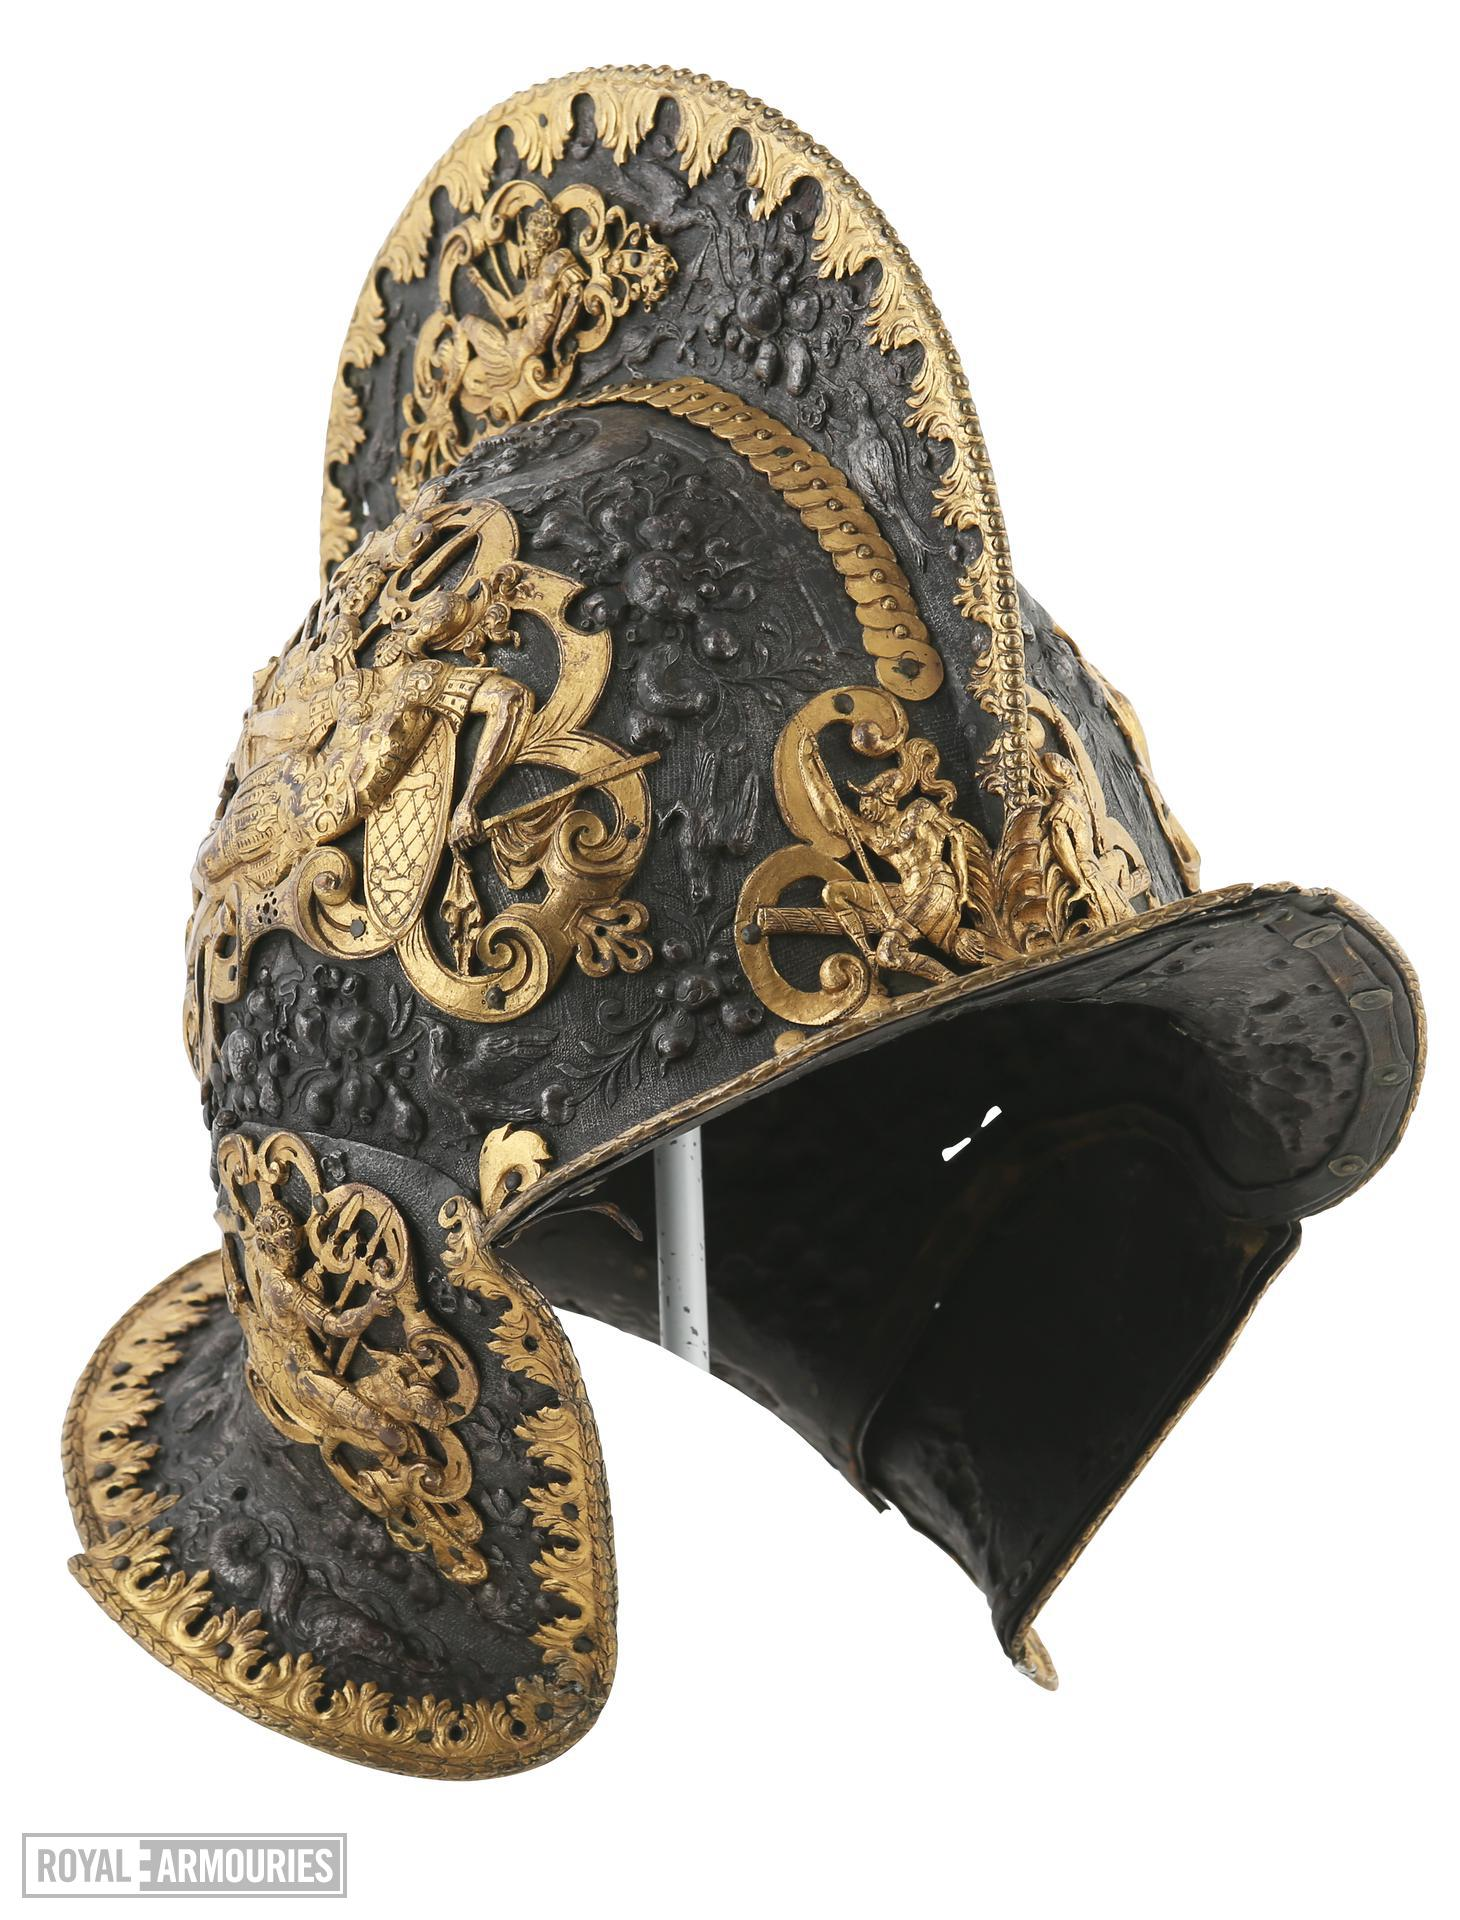 Burgonet about 1600 IV.154